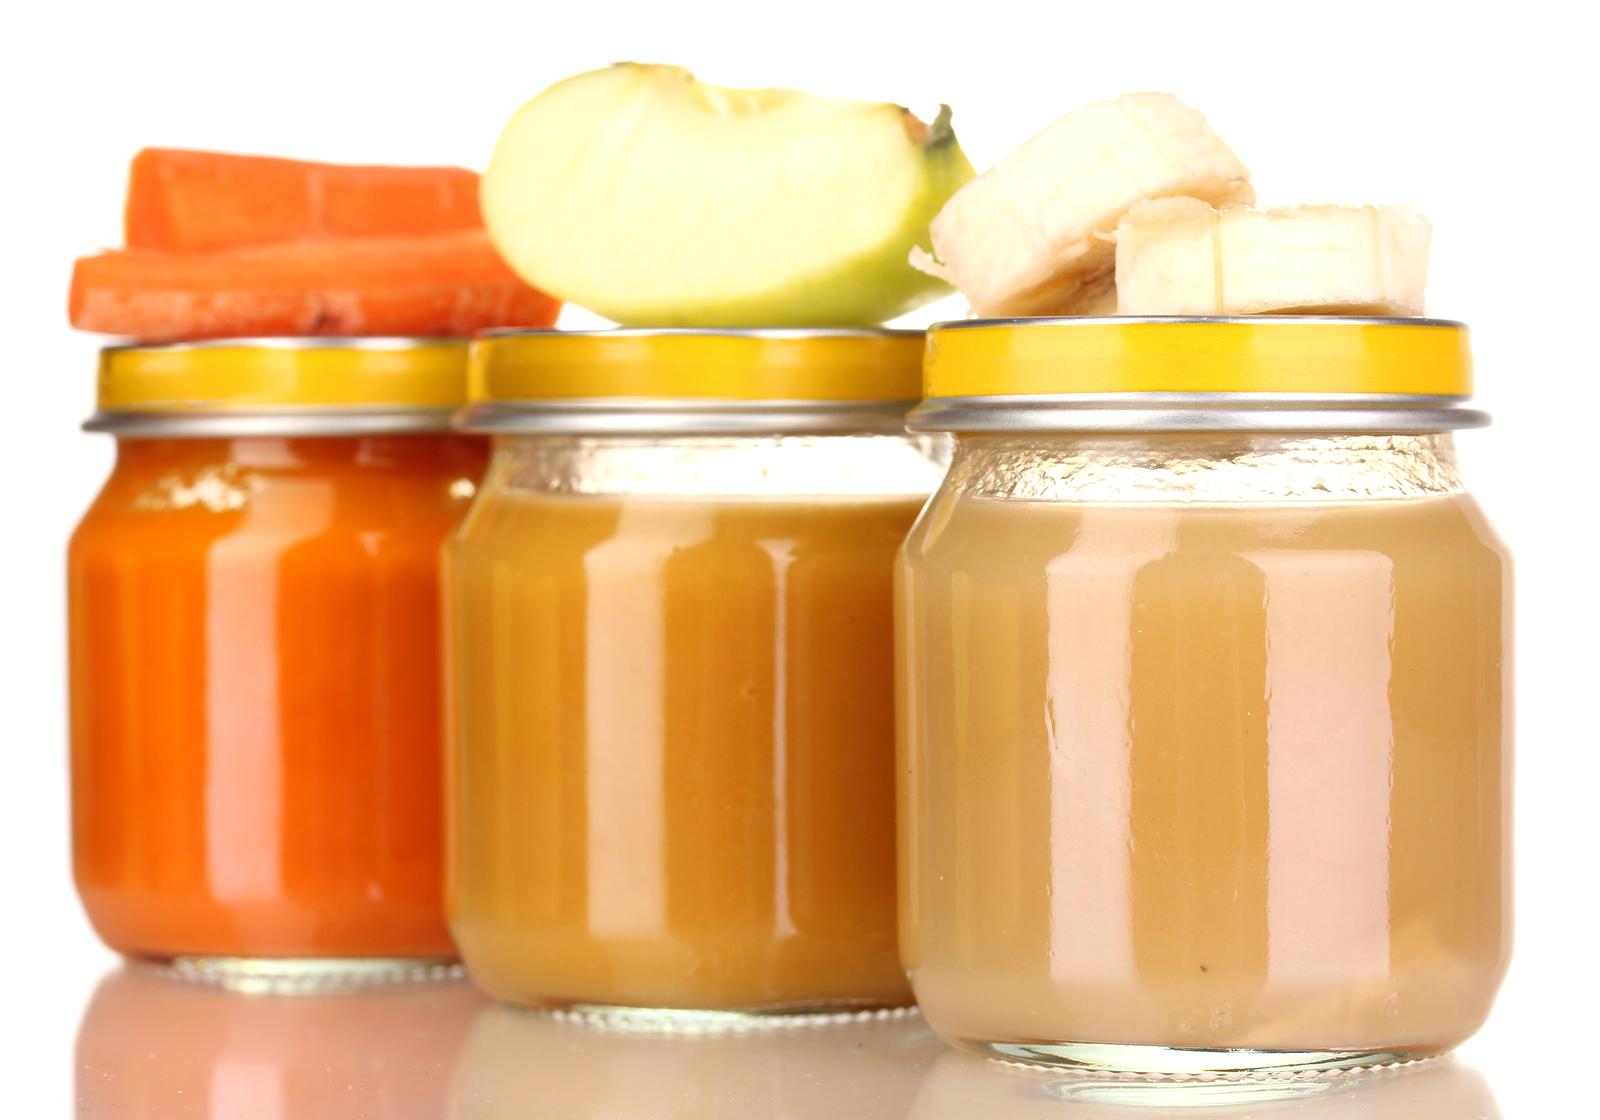 Use Squash To Make Baby Food